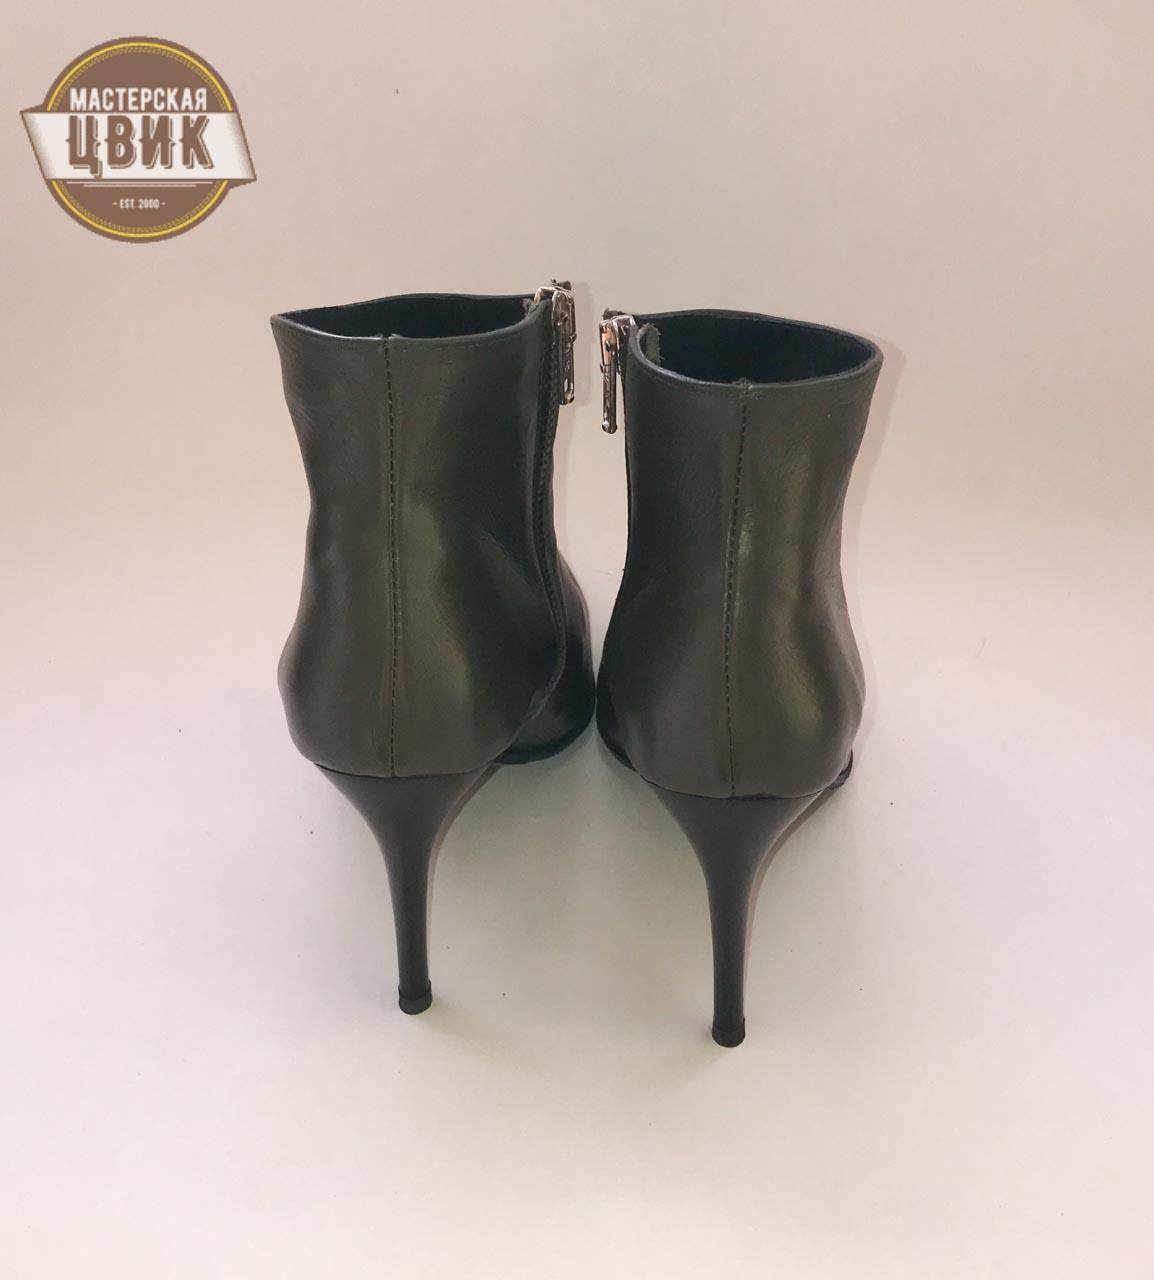 individualnyj-poshiv-obuvi-minsk-42 Индивидуальный пошив обуви